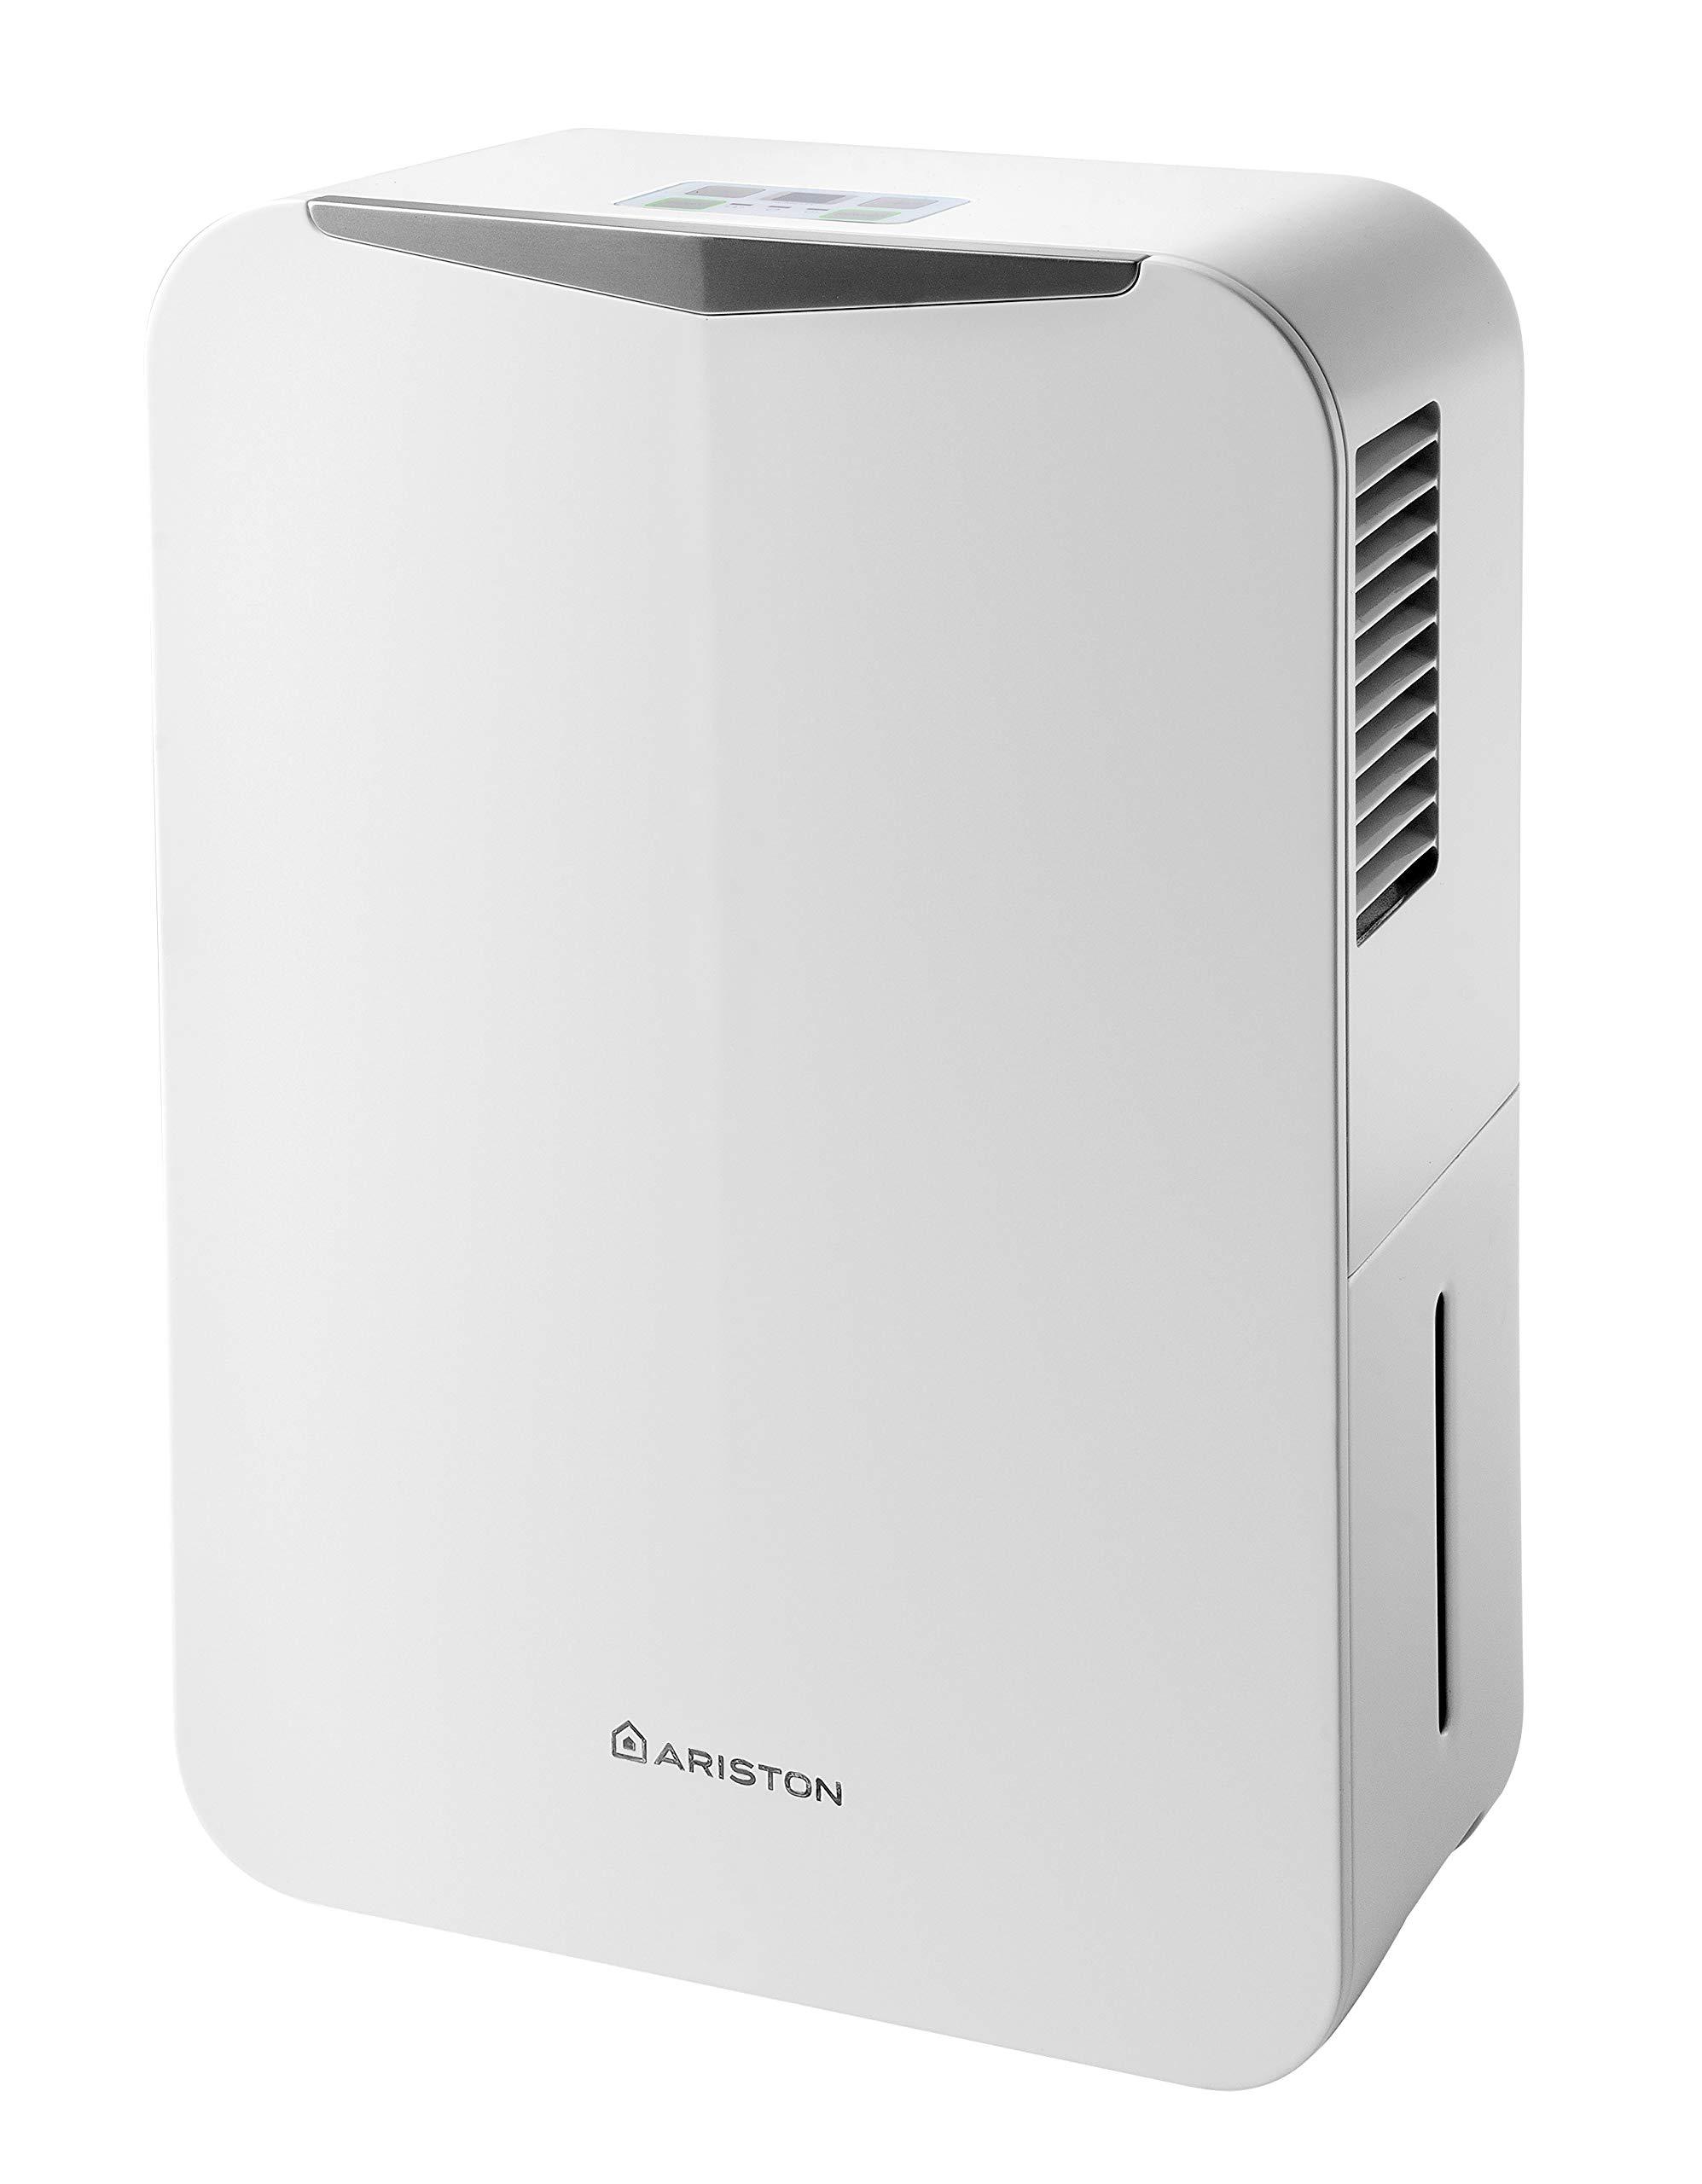 Ariston-deumidificatore-portatile